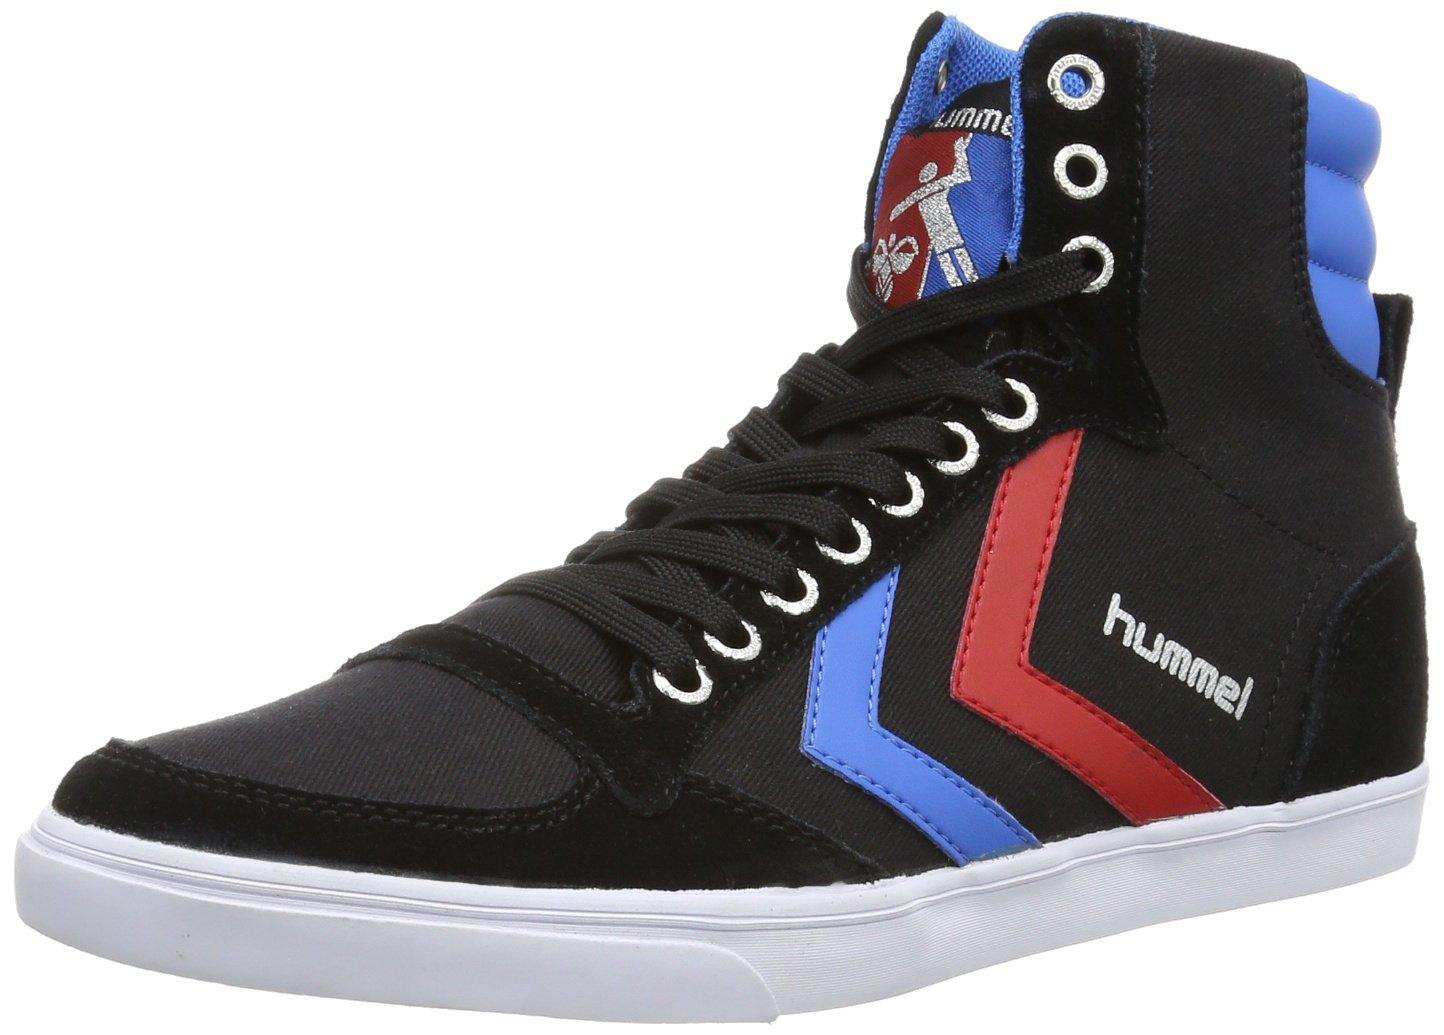 264045 red Stadil Sport Black Schwarzblack Uk High'De Eu10 5 'slimmer FashionChaussures Noir blue Slimmer Hummel Erwachsene Stadi gum vwOy8mnNP0